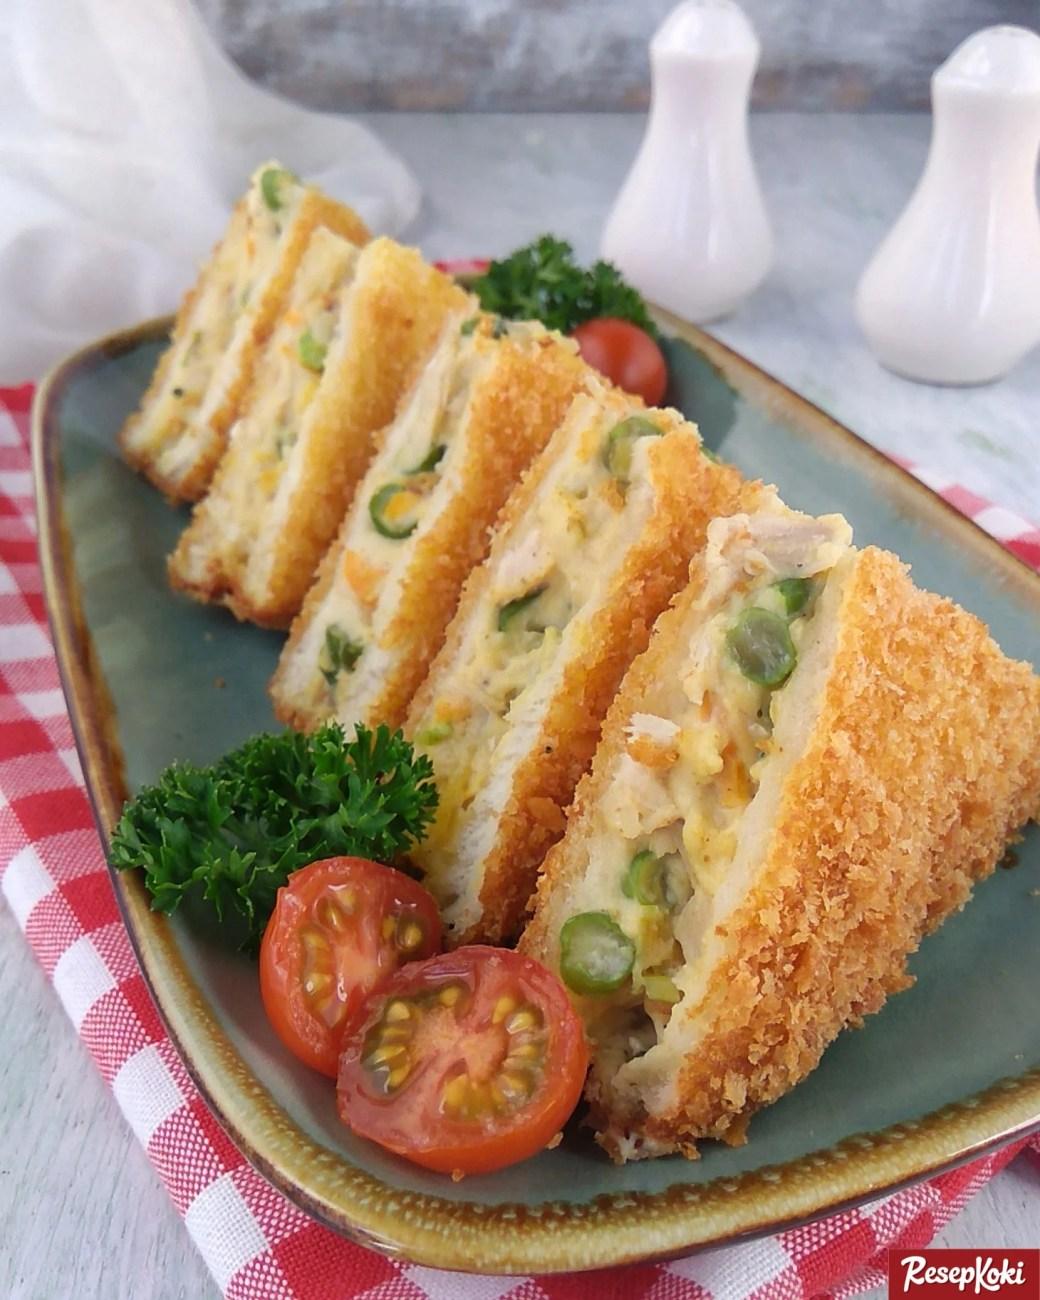 Roti Tawar Goreng Isi Ragout Krispi Mudah Dibuat Resep Resepkoki